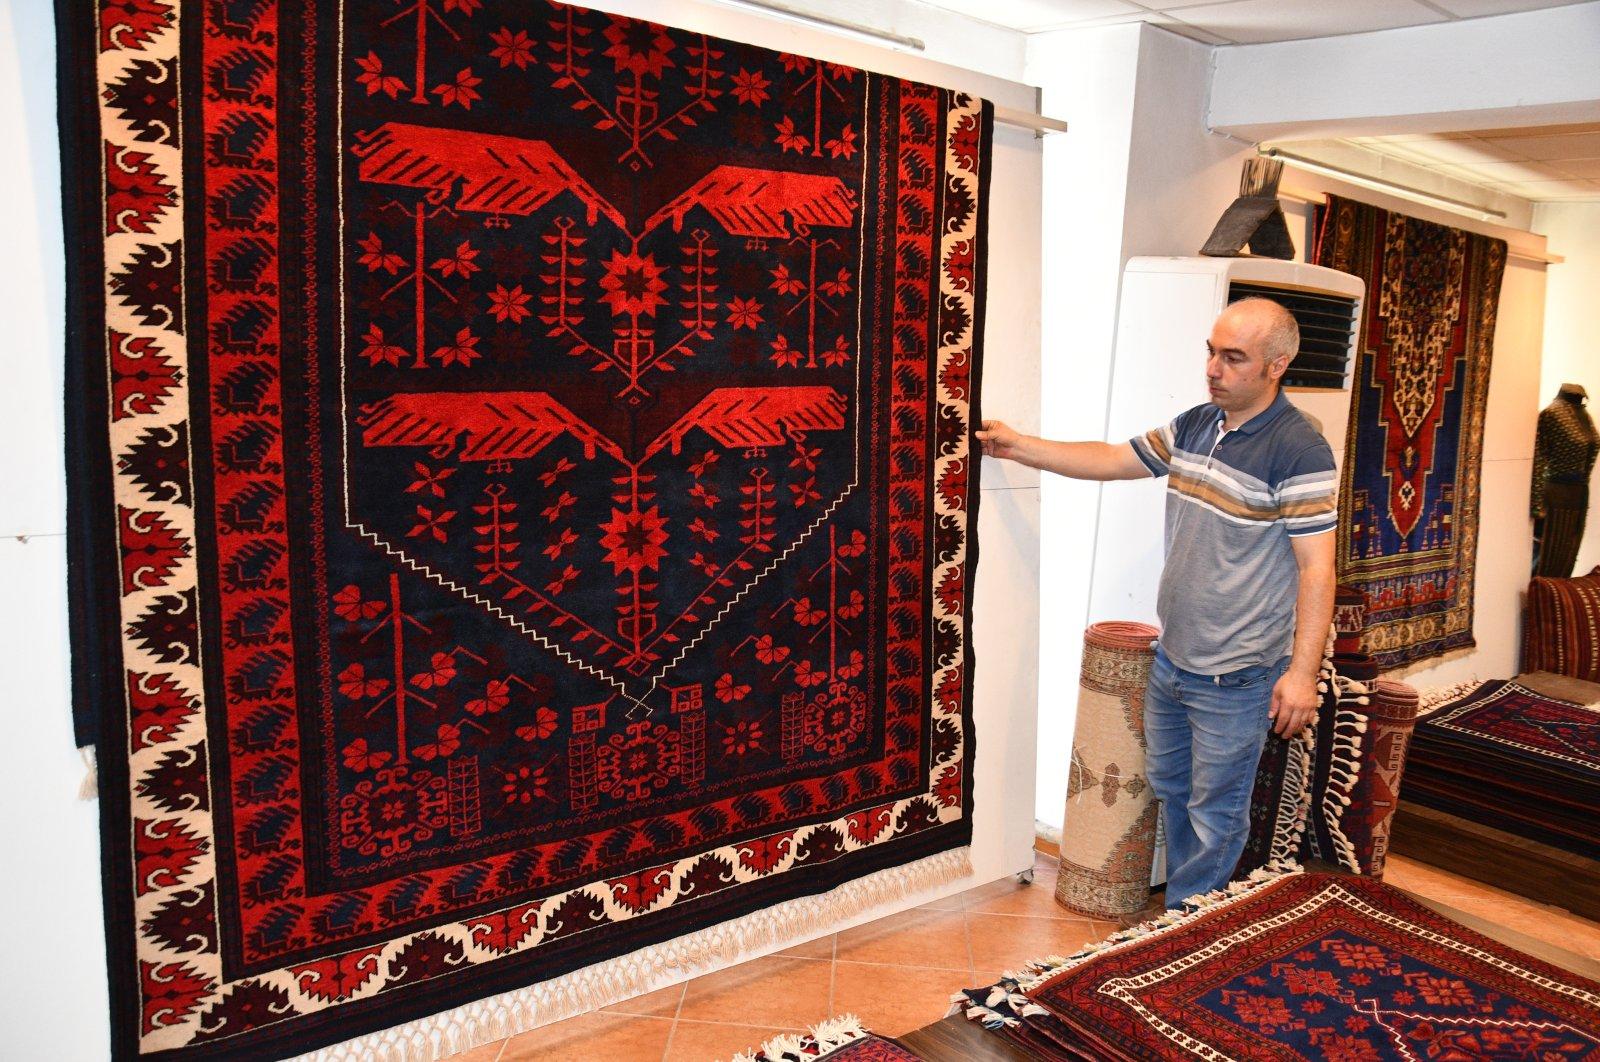 A Yağcıbedir carpet is seen with its vivid colors in Sındırgı district, Balıkesir, western Turkey, Oct. 14, 2020. (AA Photo)